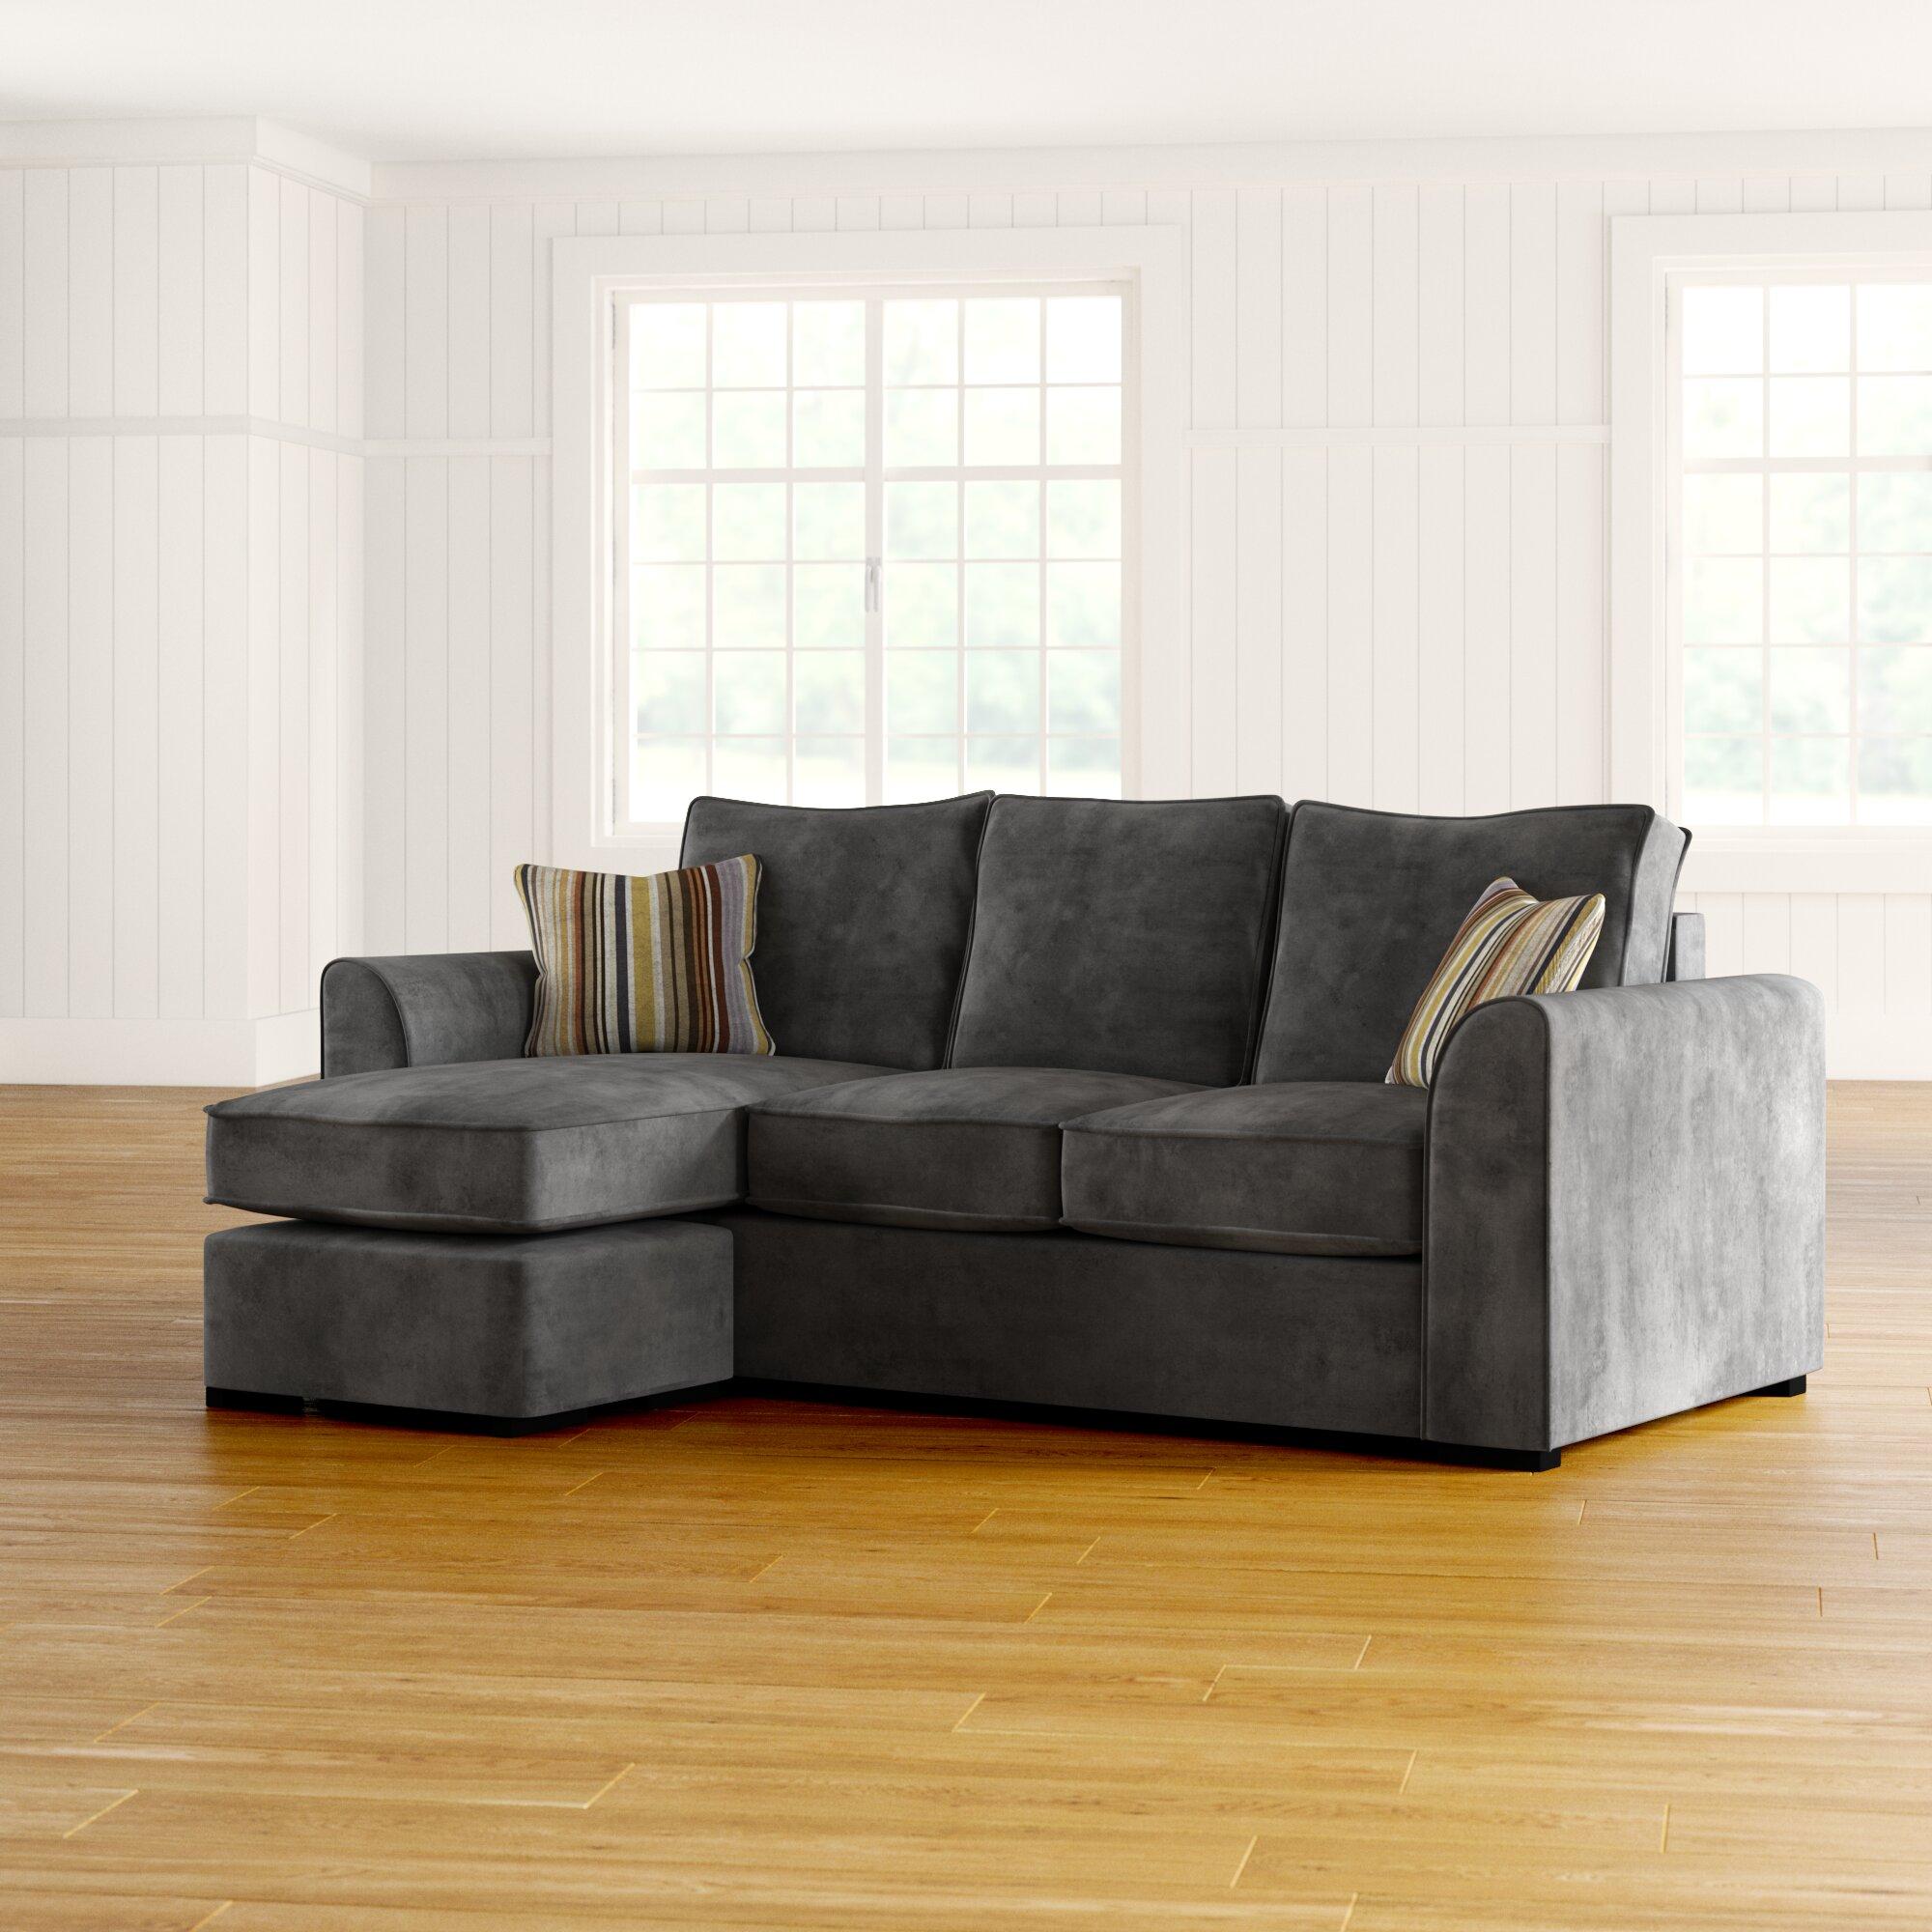 sofa factory lara reversible corner sofa wayfair co uk rh wayfair co uk reversible corner sofa beds aberdeen Reversible Reaction